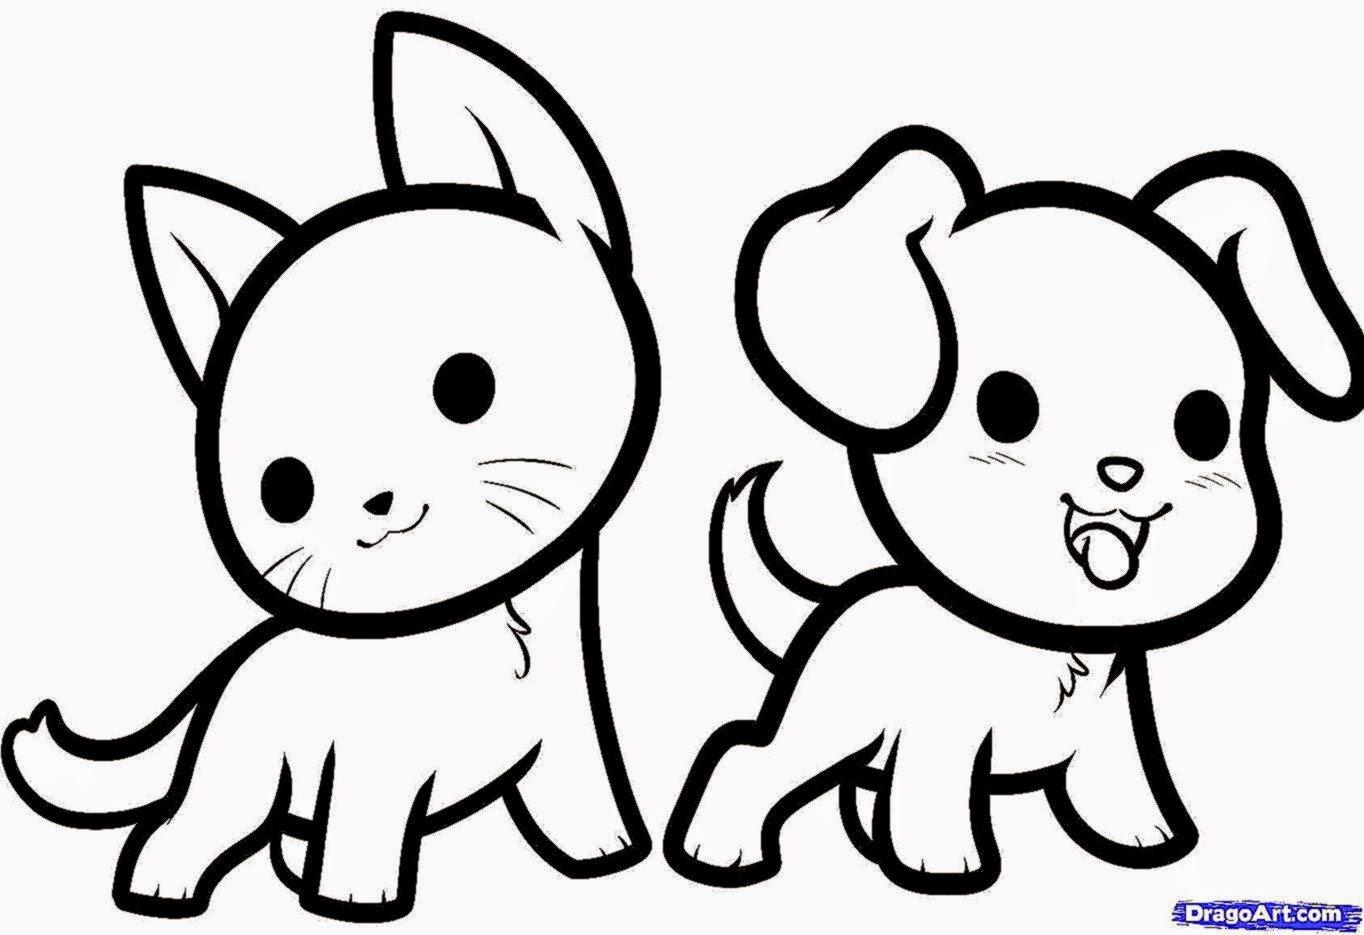 1364x935 Easy To Draw Cute Animal Drawings Cute Drawings